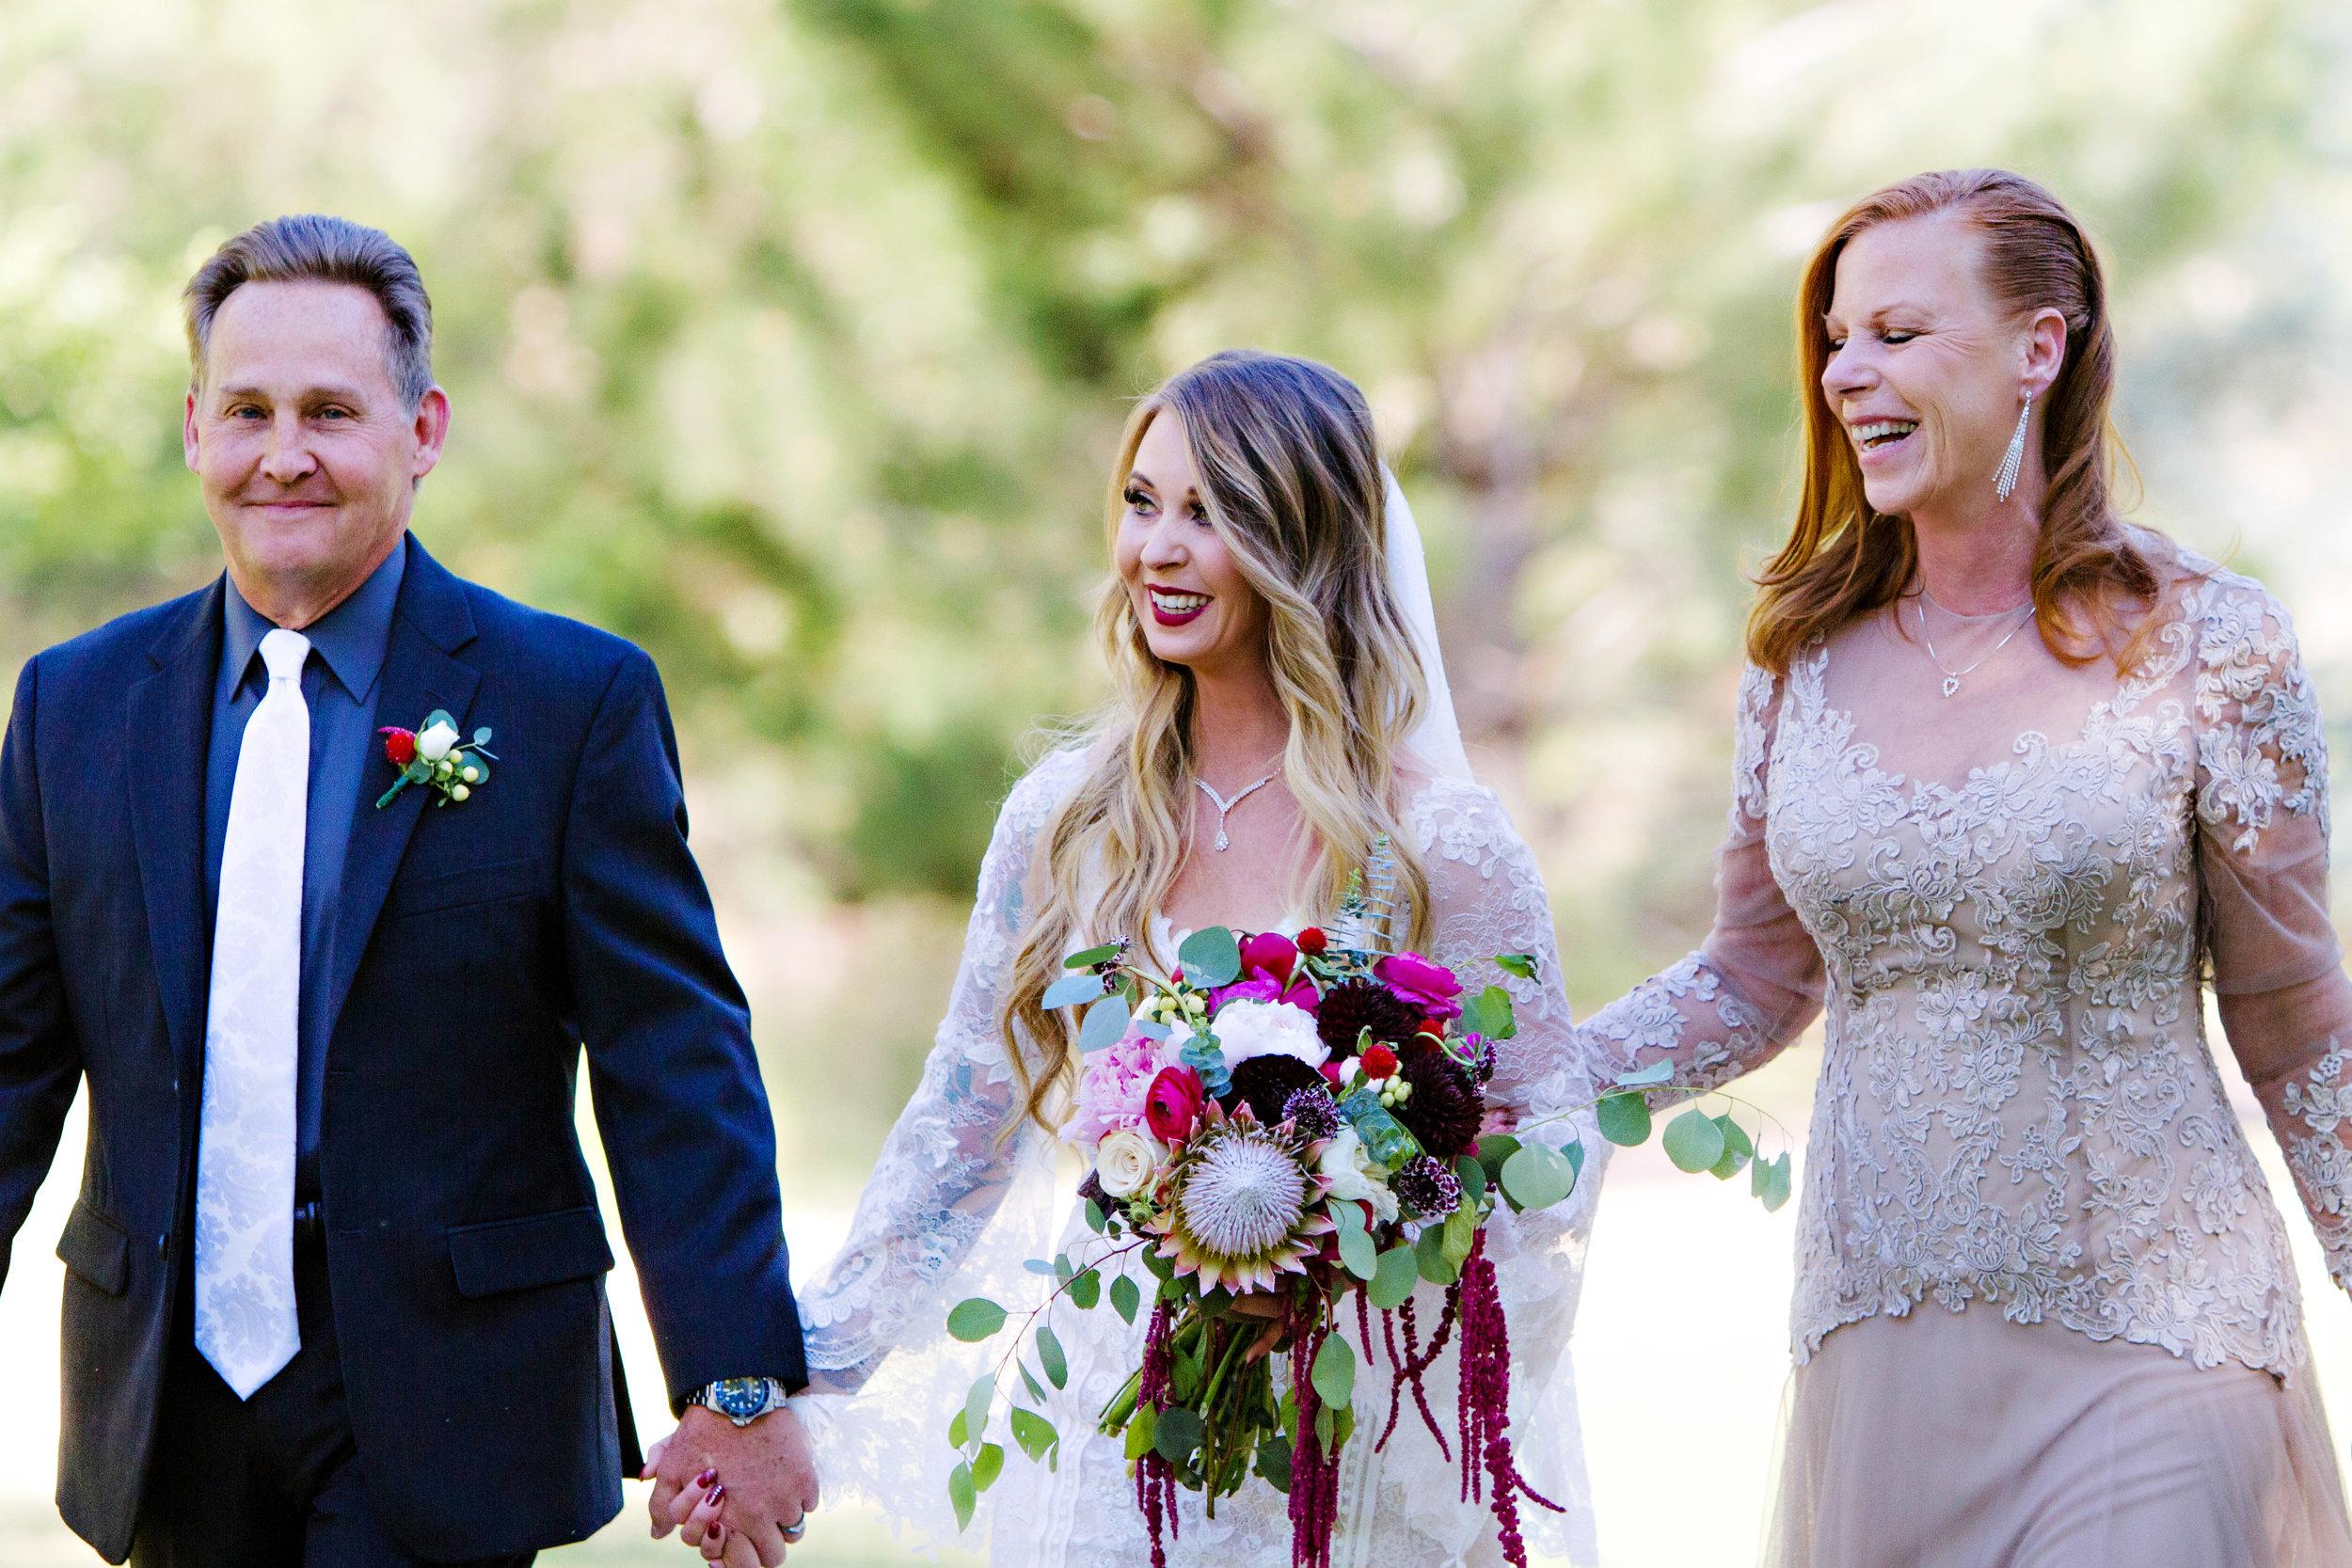 weddings-payson-08.jpg